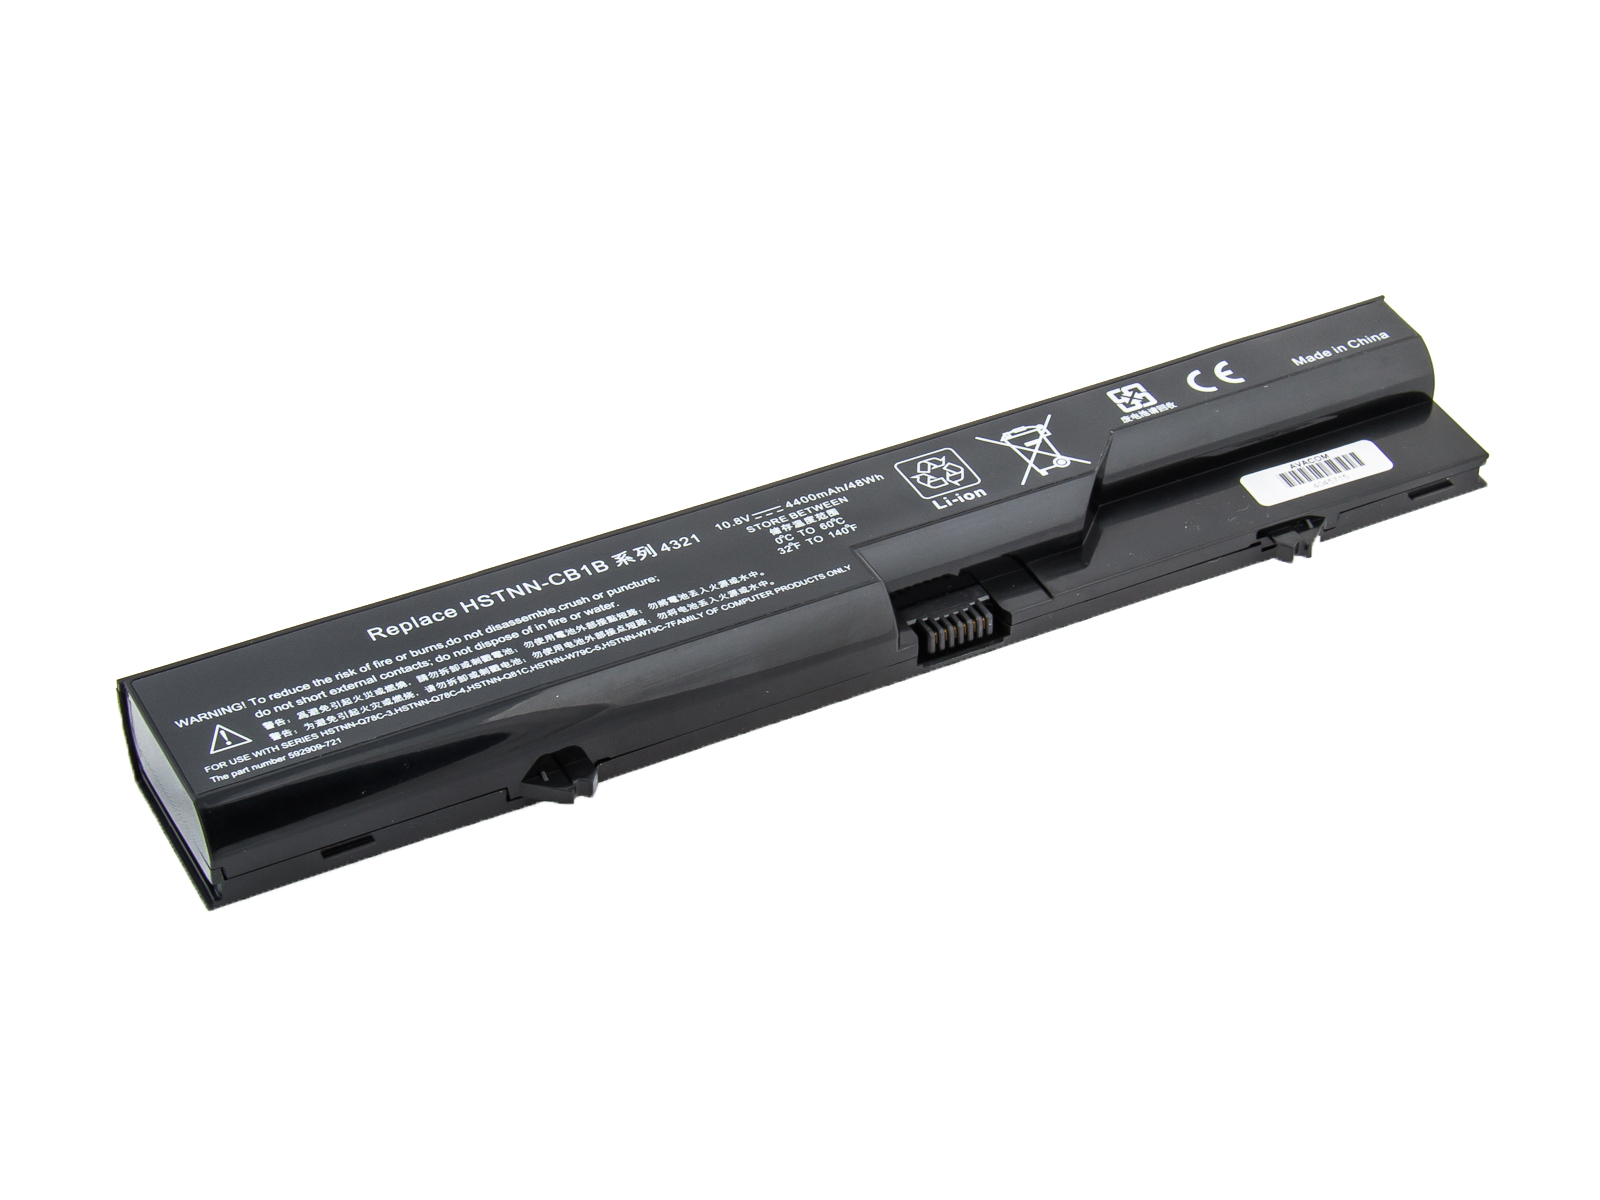 Baterie AVACOM NOHP-PB20-N22 pro HP ProBook 4320s/4420s/4520s series Li-Ion 10,8V 4400mAh